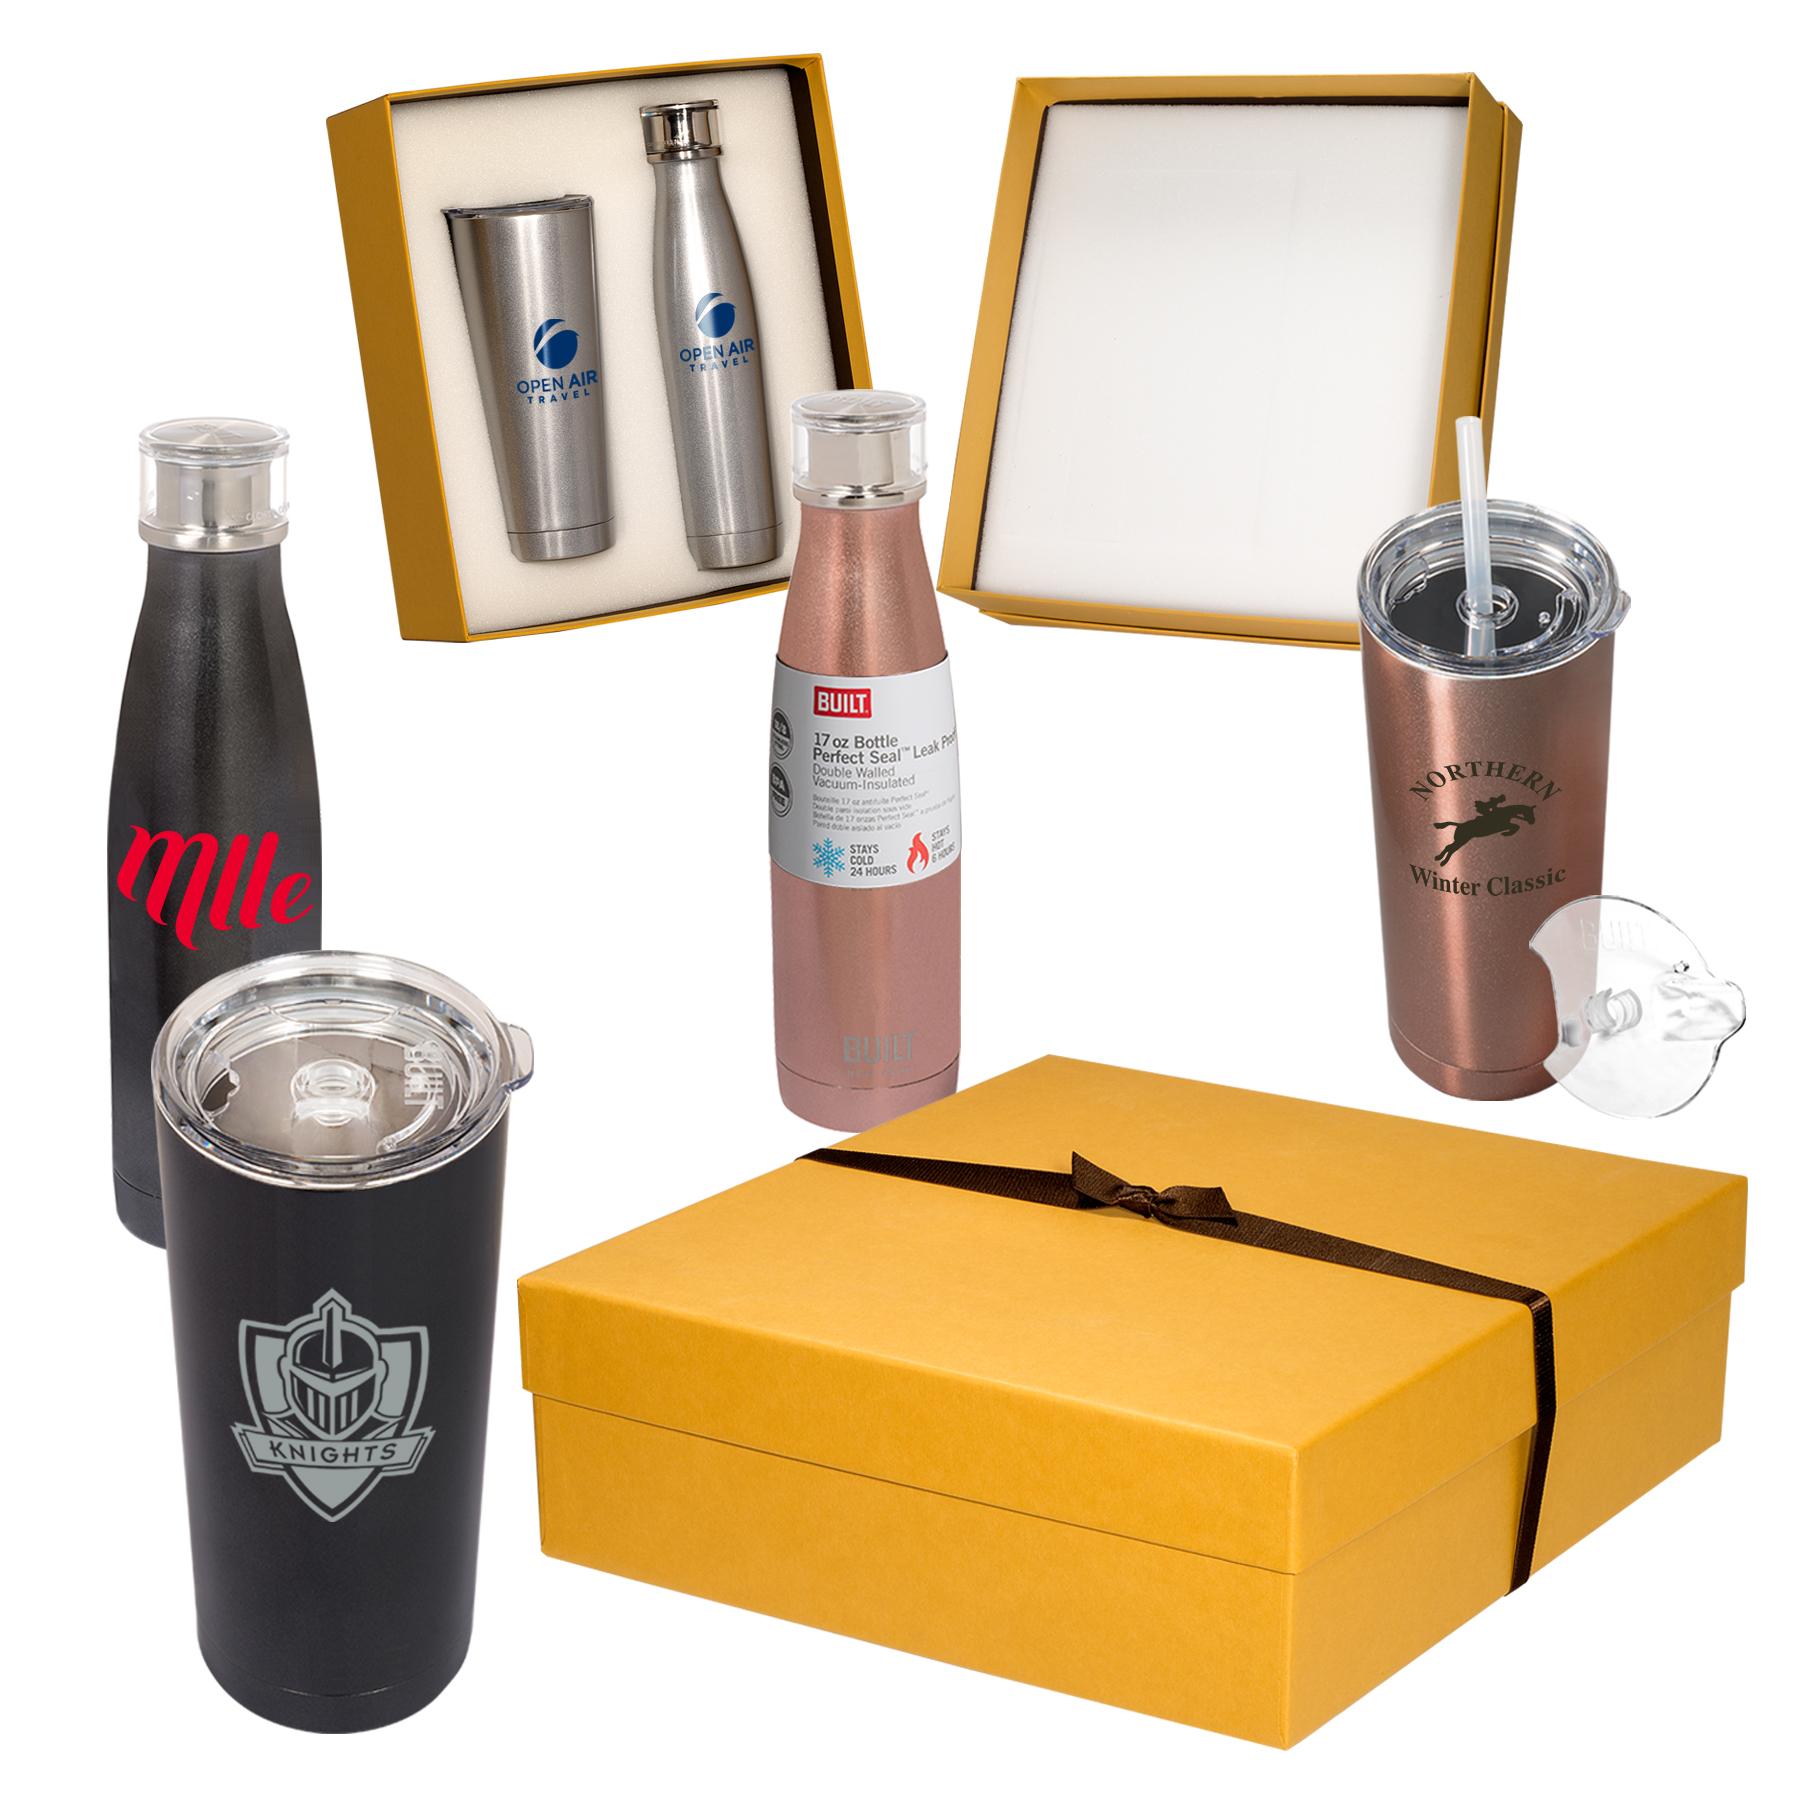 Built® Duo Vacuum Insulated Drinkware Gift Set